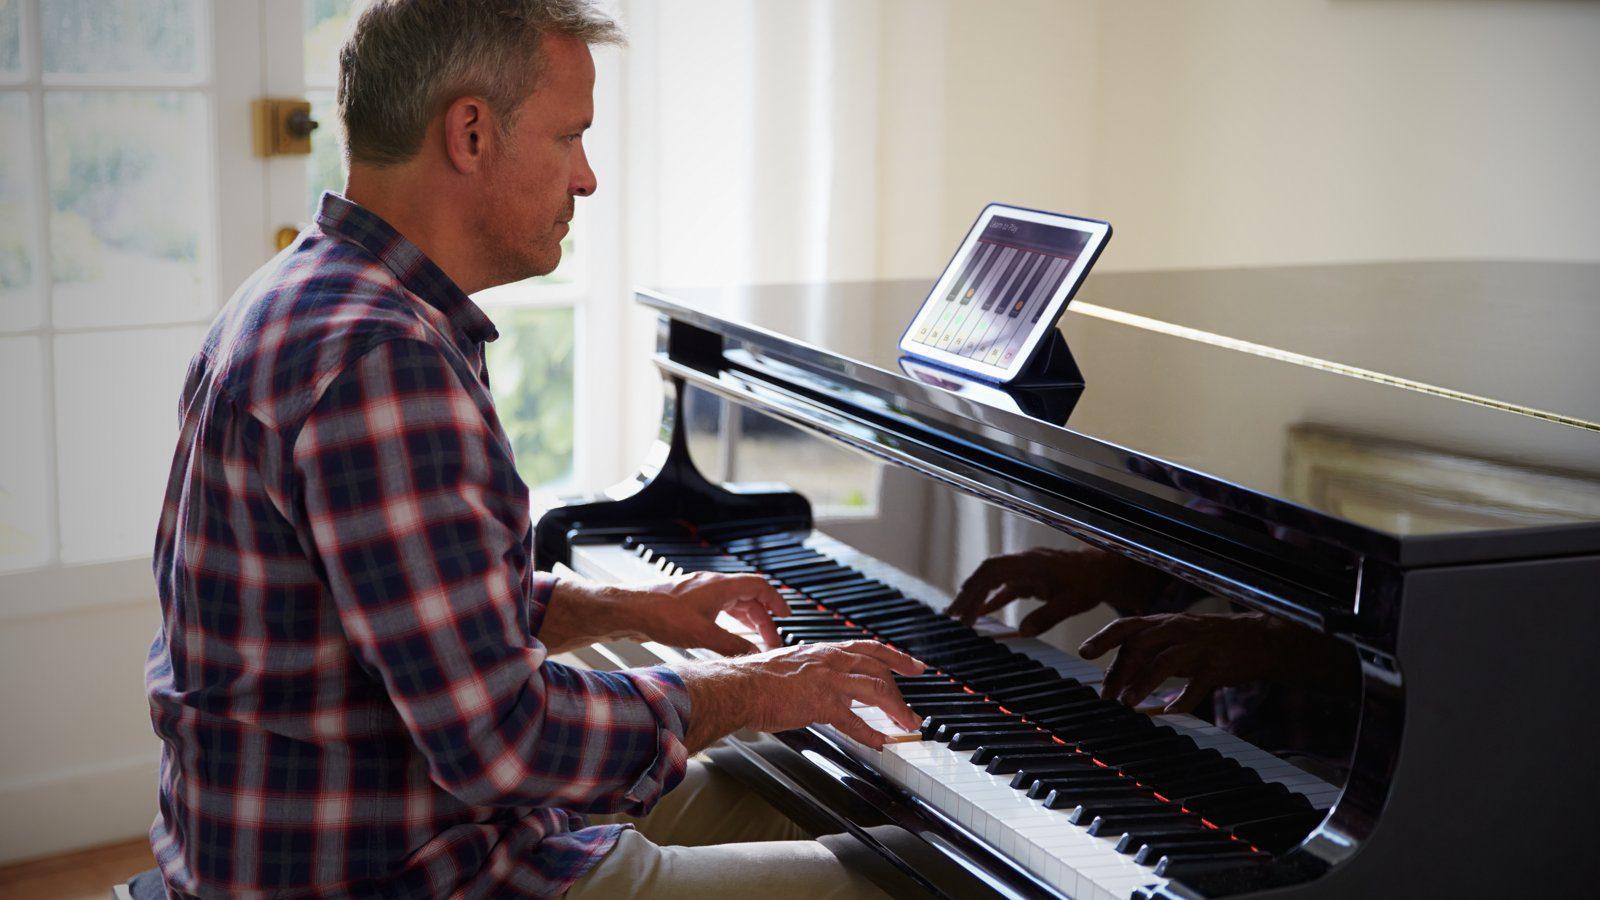 Online Klavier lernen (Bildquelle: shutterstock.com)